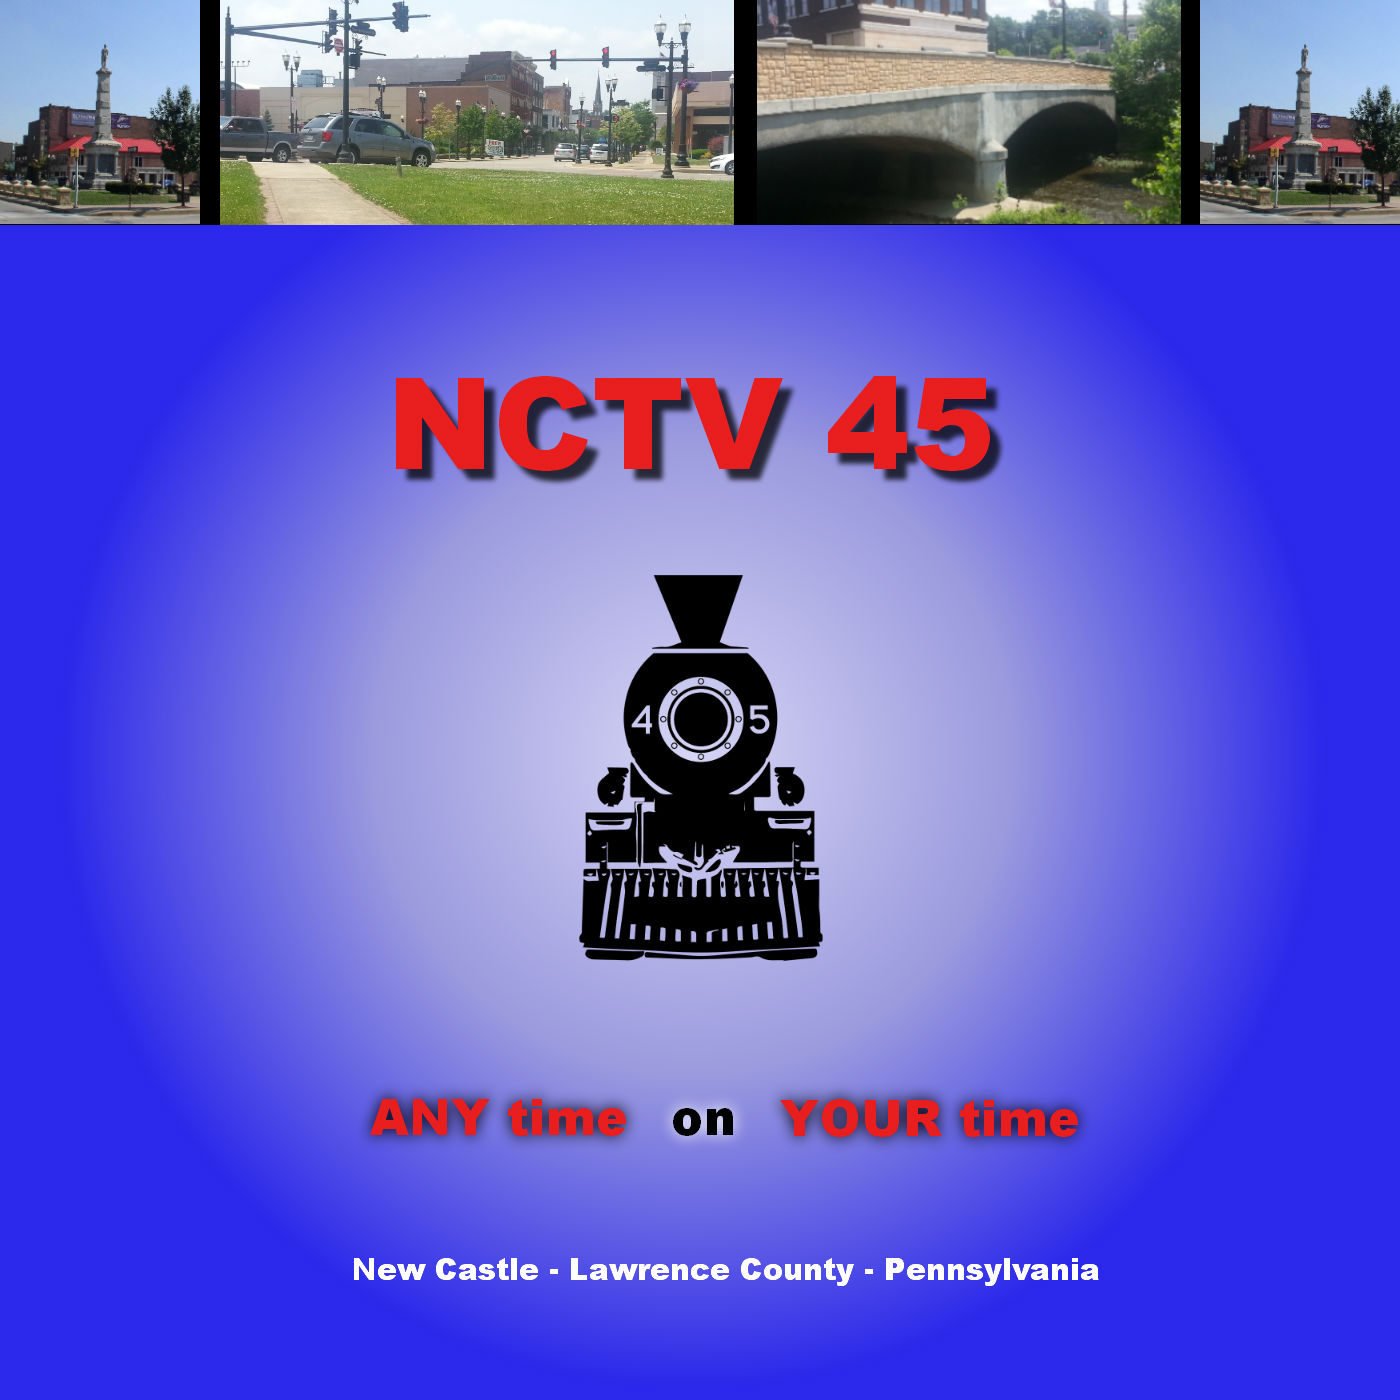 Artwork for NCTV45's Lawrence County Community Happenings February 10 Thru Feb 16 2019